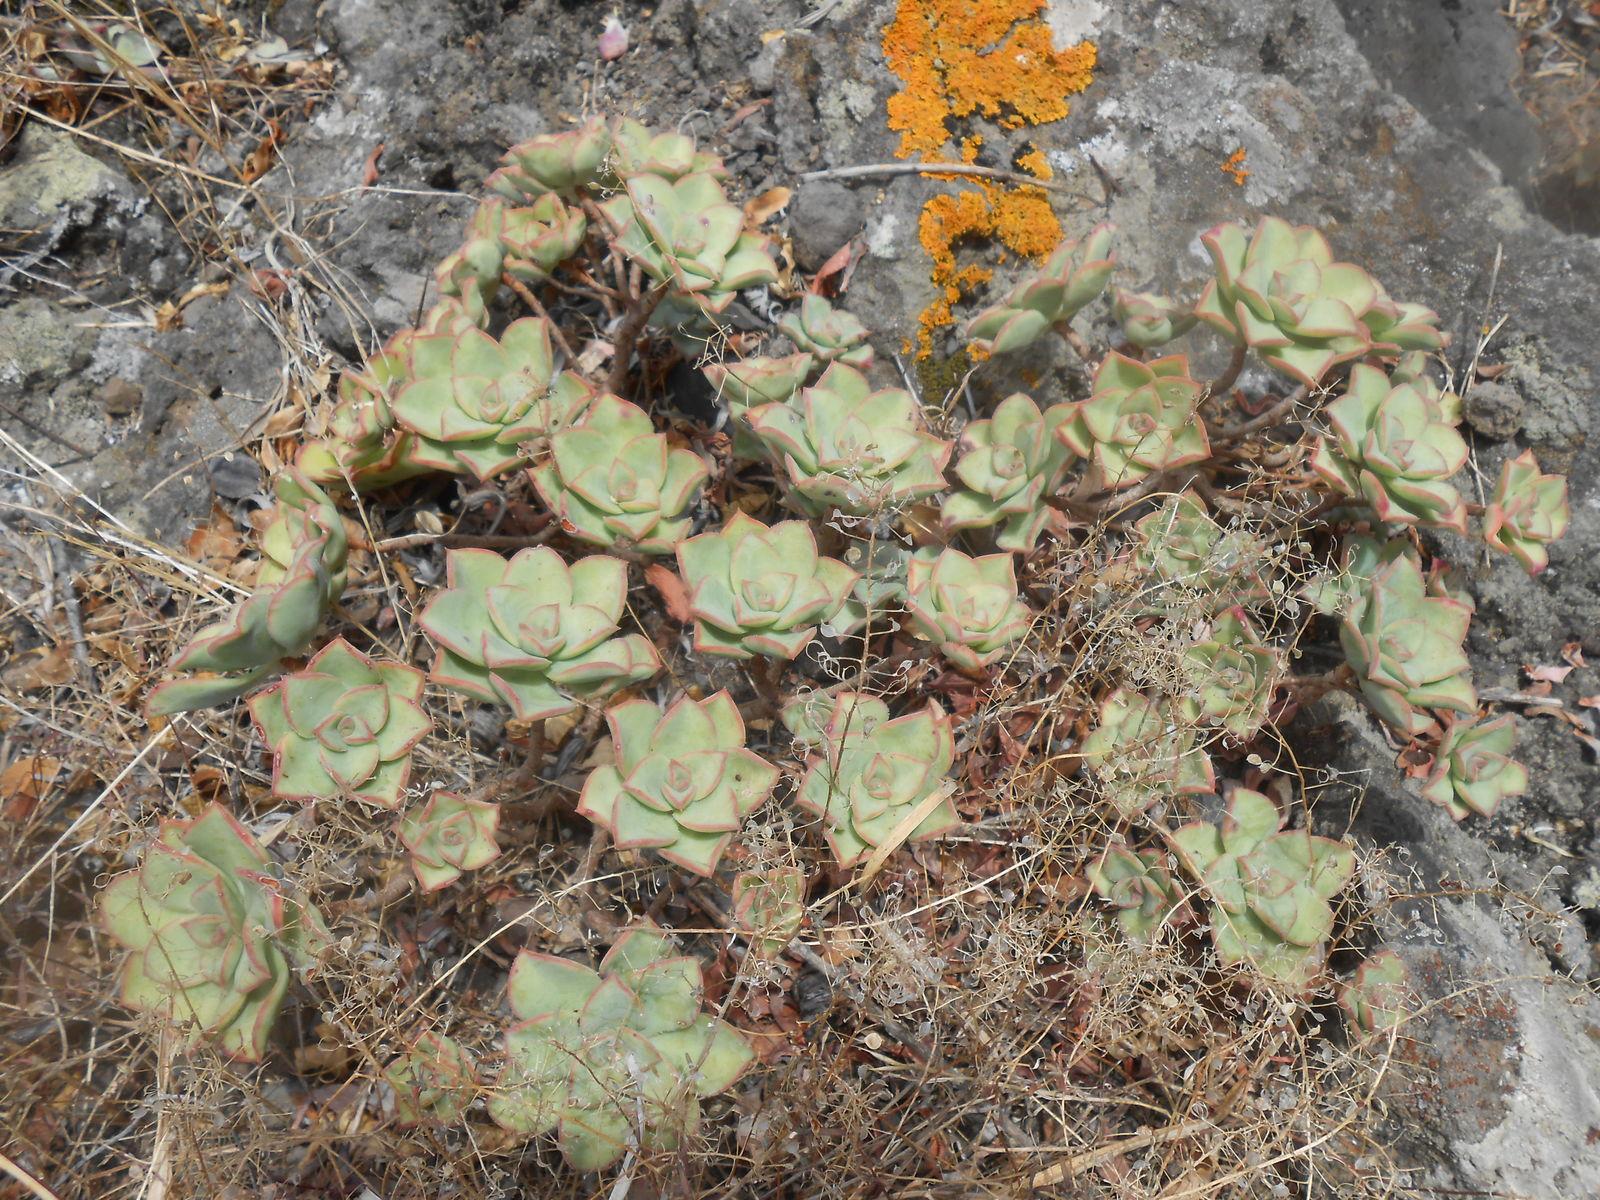 Aeonium Haworthii Webb Berthel Plants Of The World Online Kew Science